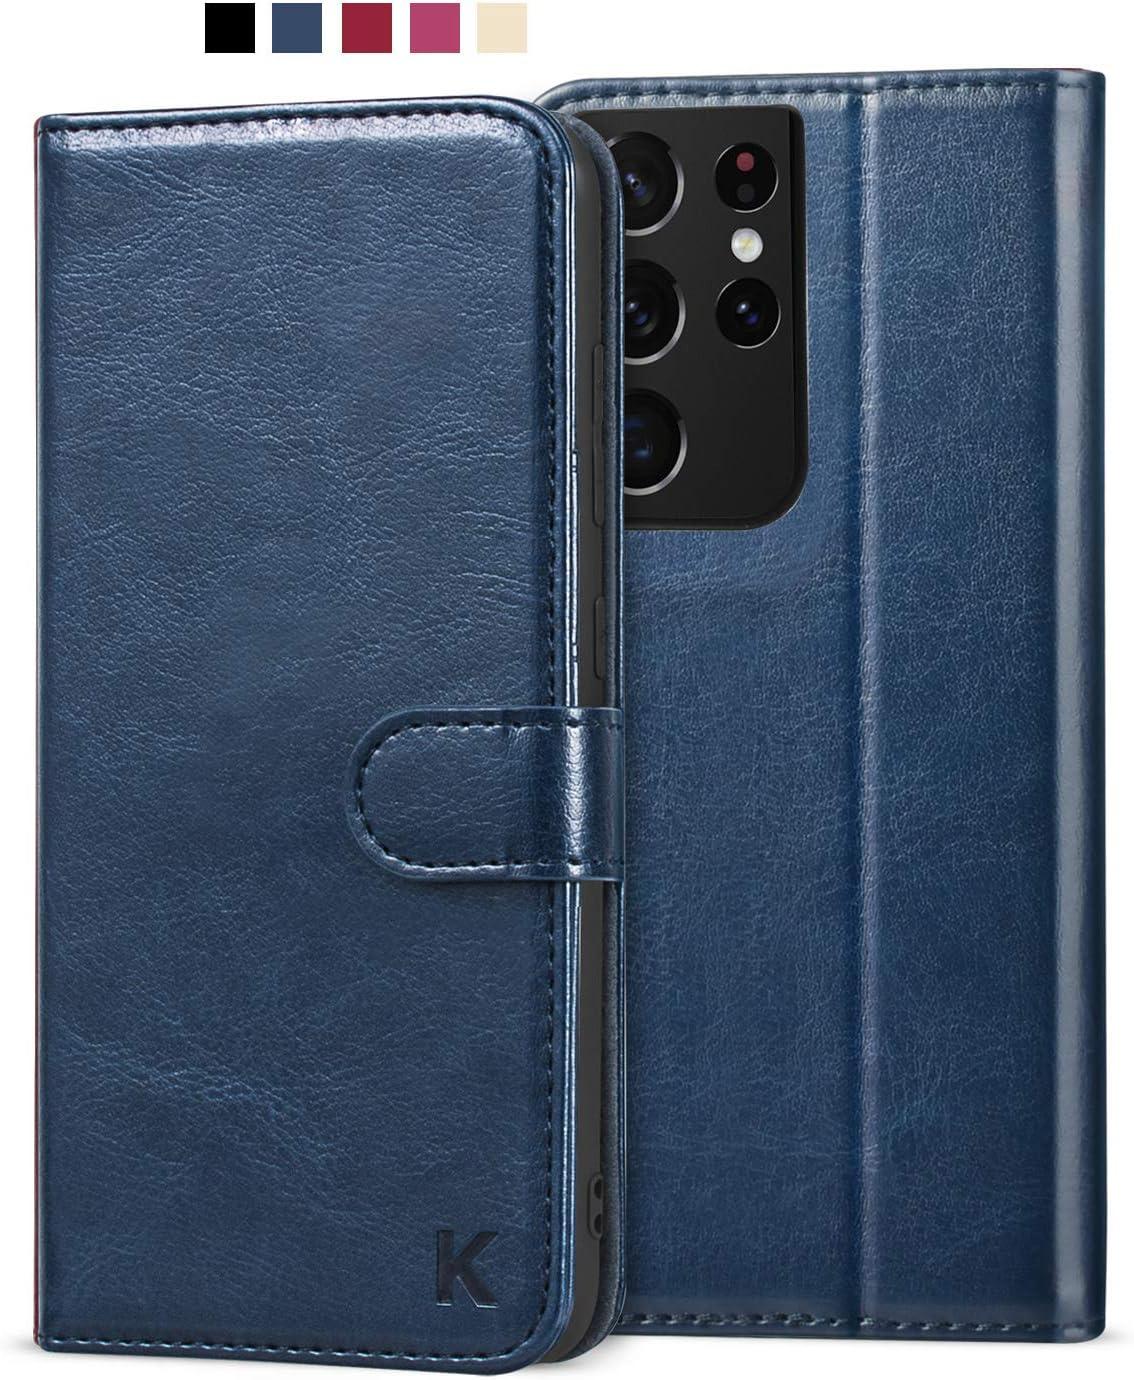 KILINO Galaxy S21 Ultra Wallet Case [RFID Blocking] [PU Leather] [Shock-Absorbent Bumper] [Soft TPU] [Card Slots] [Kickstand] Flip Folio Cover for Samsung Galaxy S21 Ultra 5G (Blue)